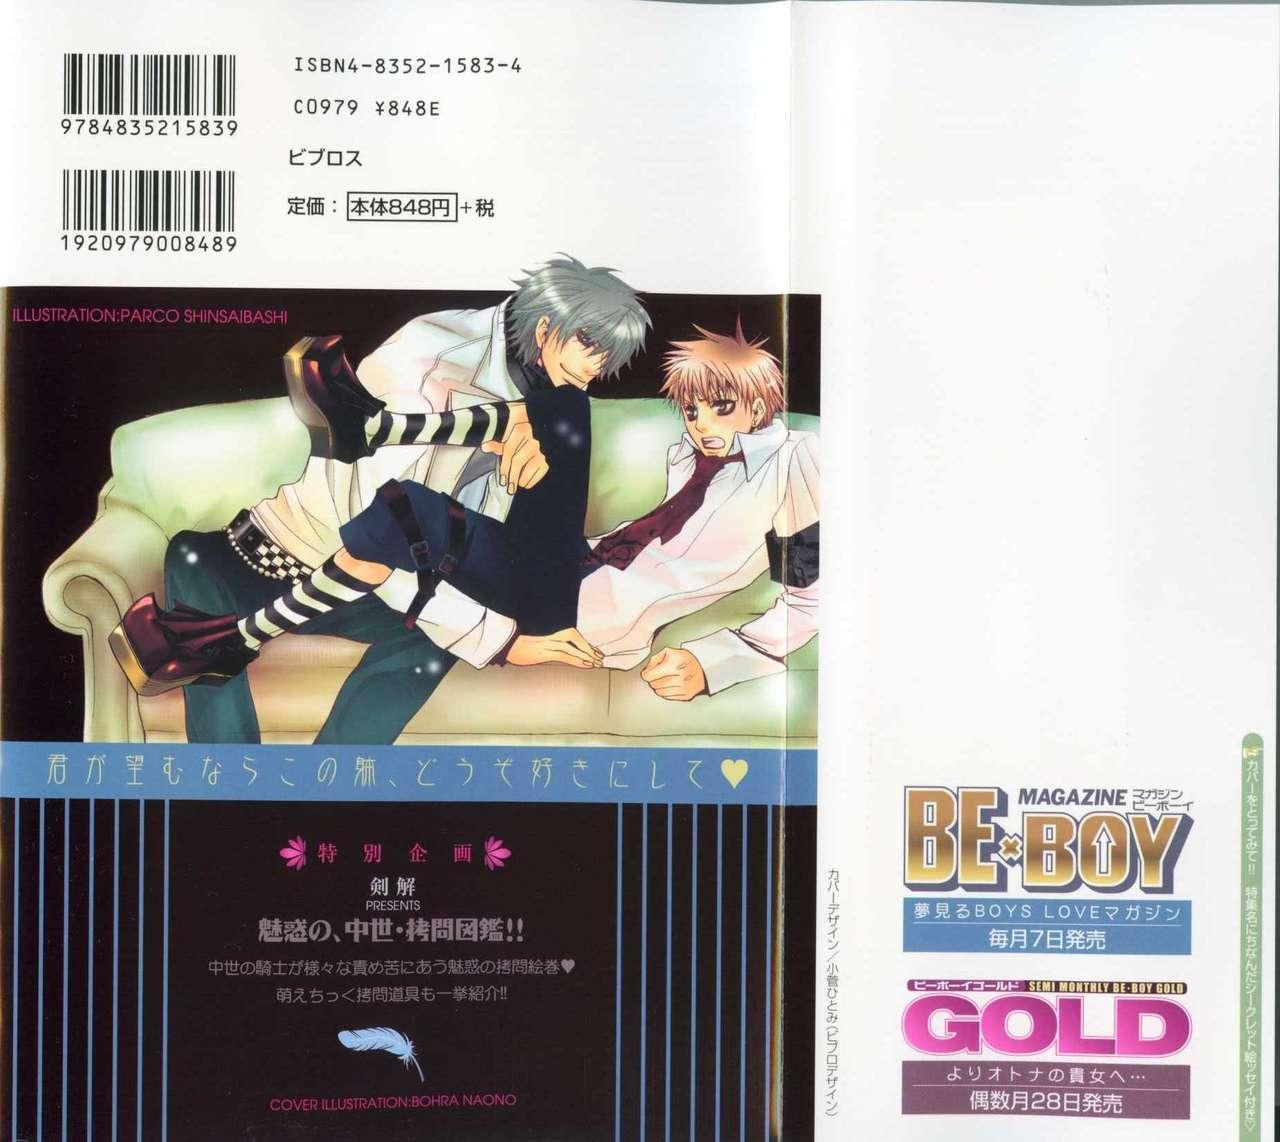 B-BOY LUV 09 いけにえ特集 1